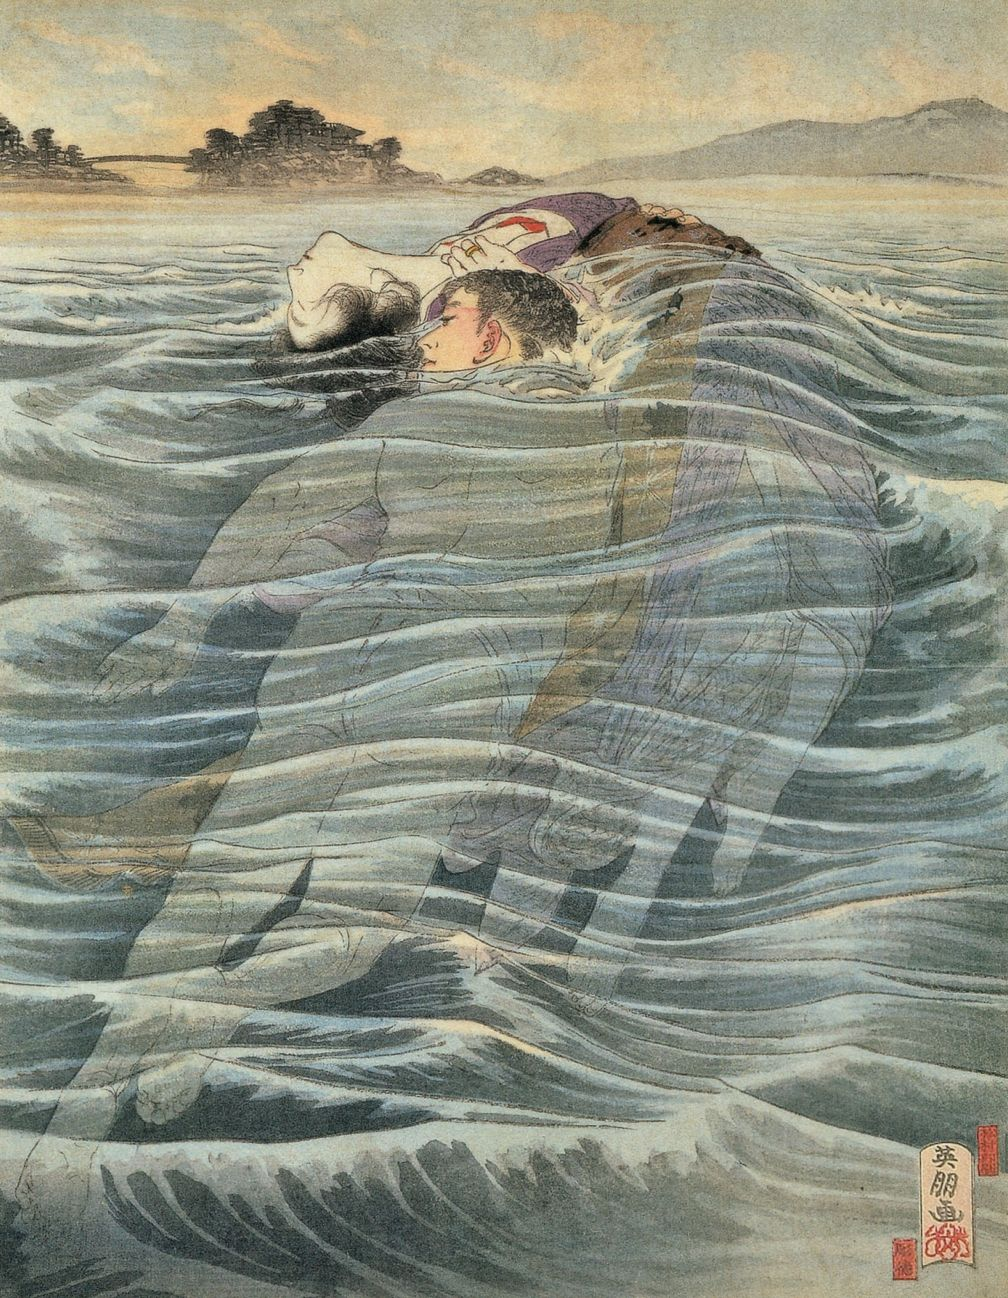 Hirezaki Eihou (鰭崎英朋 1881-1968) - 続風流線 1905